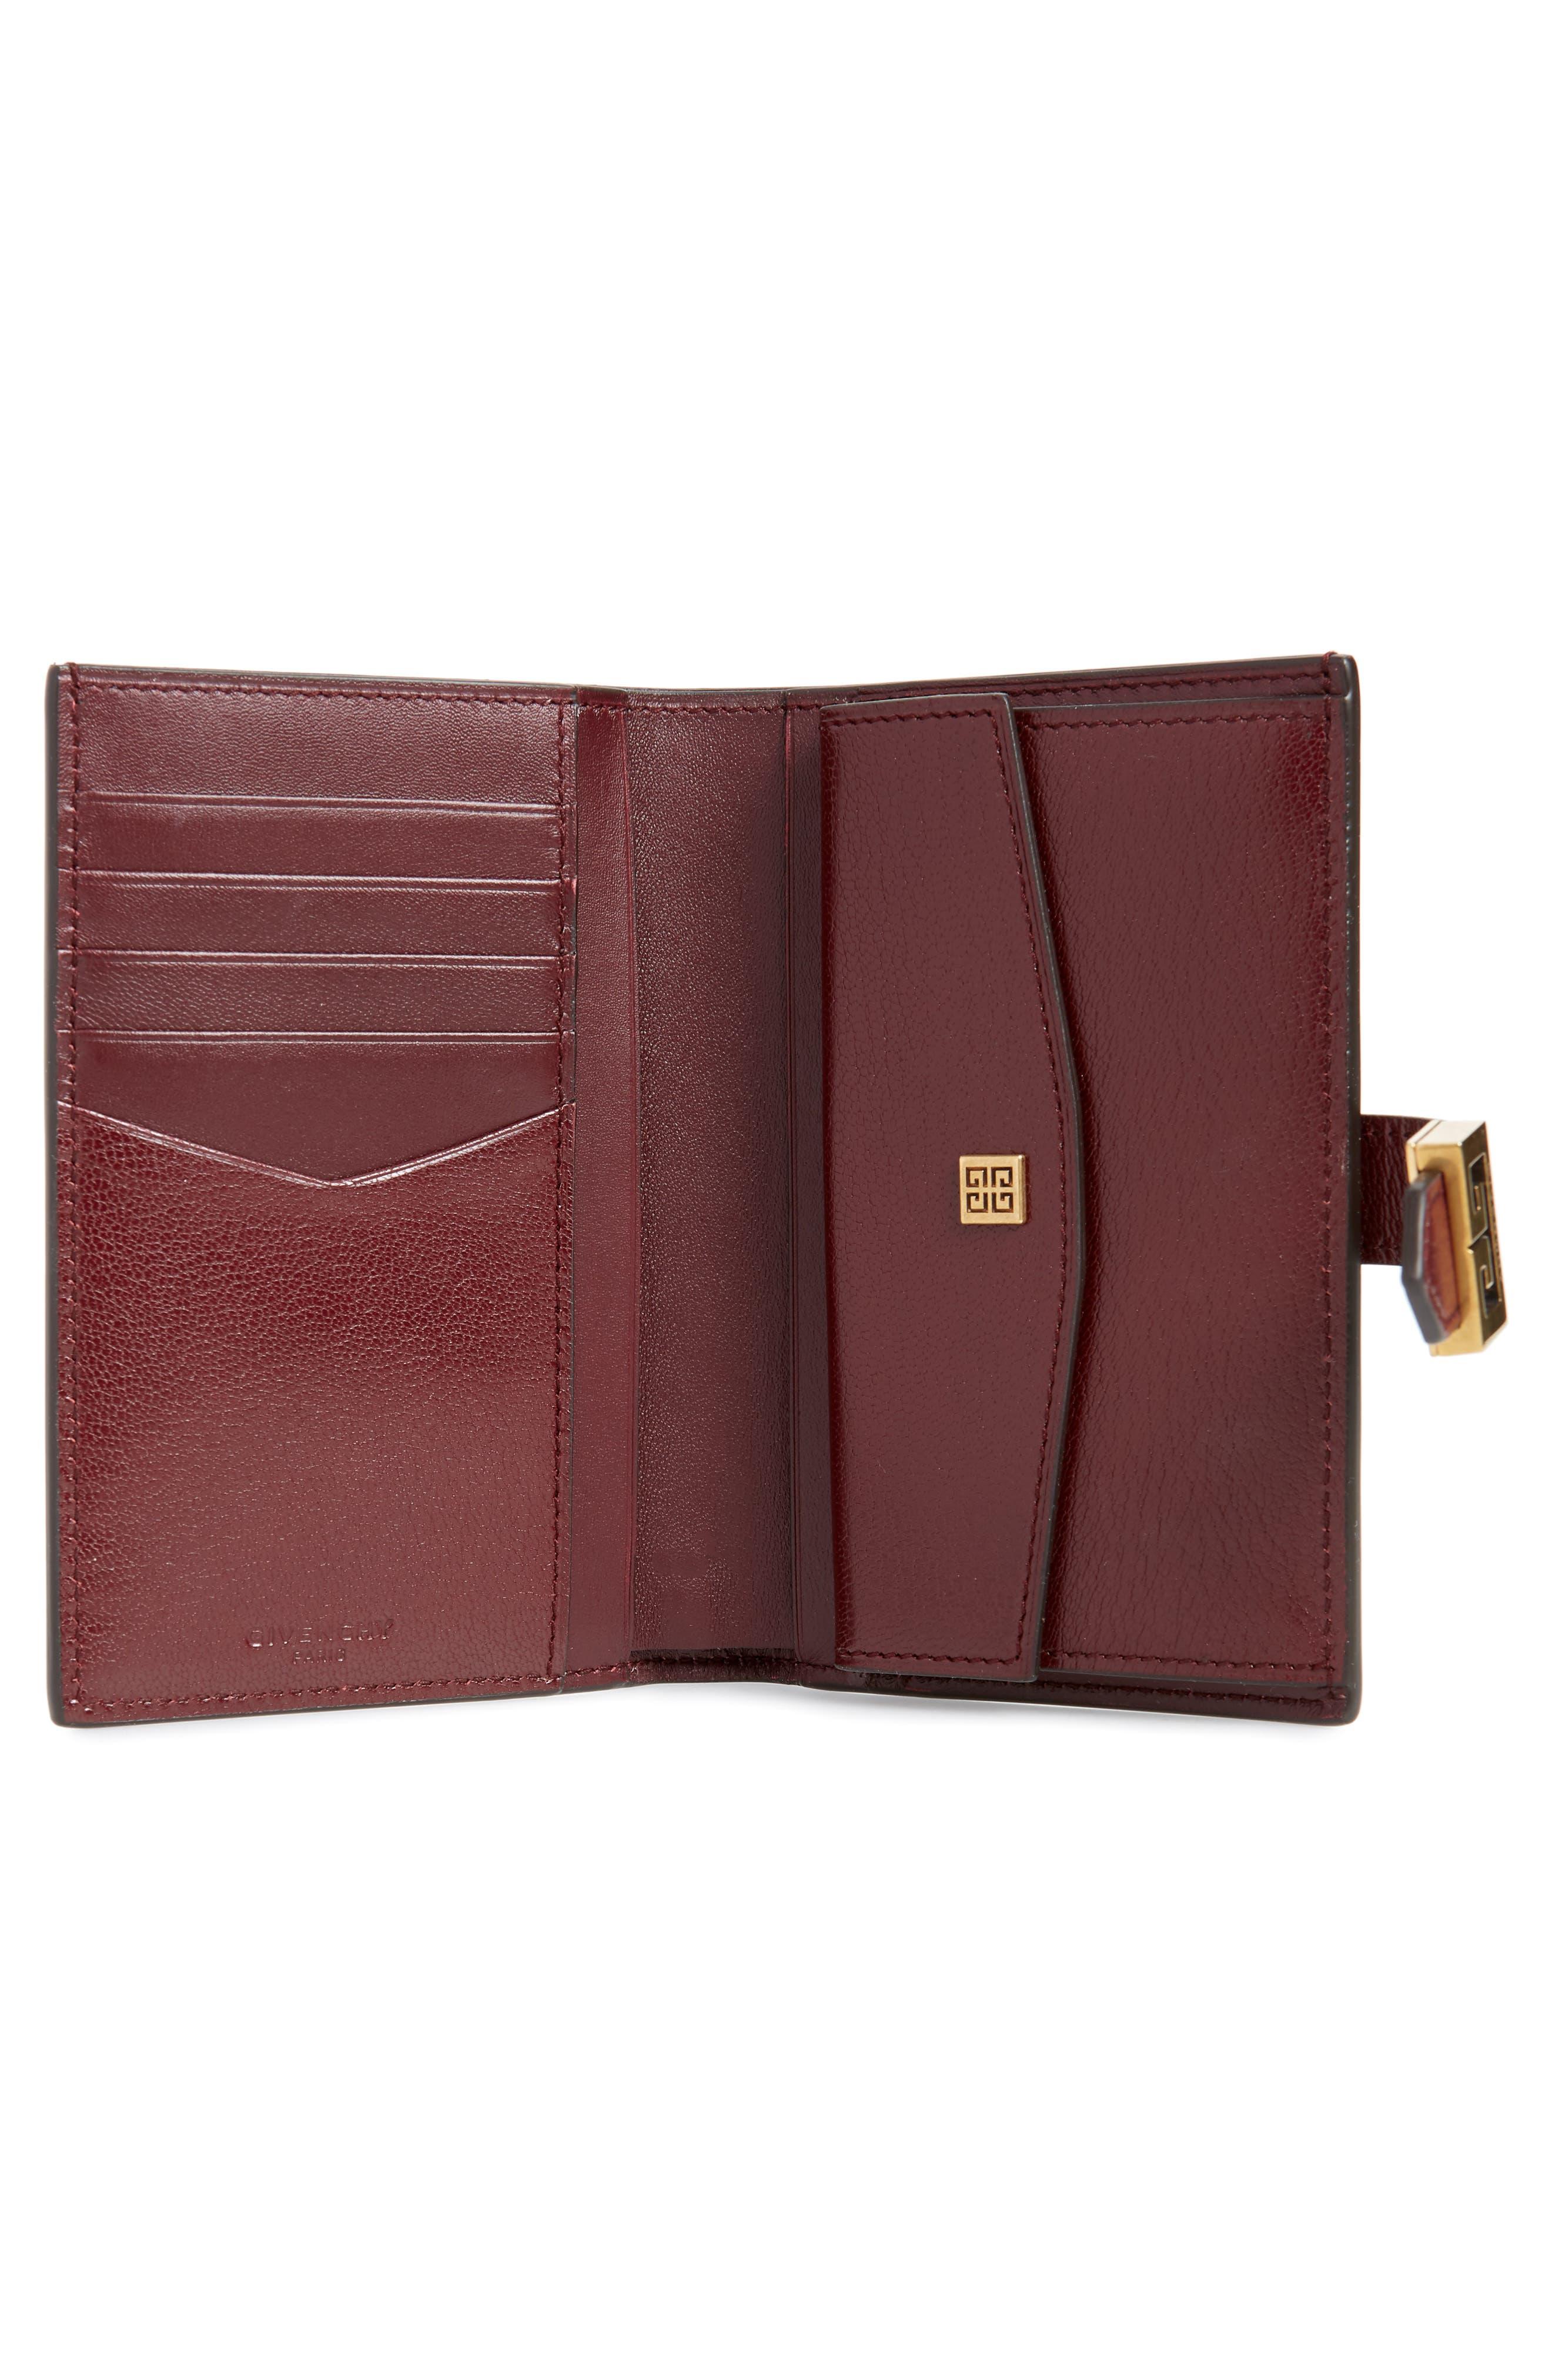 Medium GV3 Diamond Quilted Leather Wallet,                             Alternate thumbnail 2, color,                             AUBERGINE